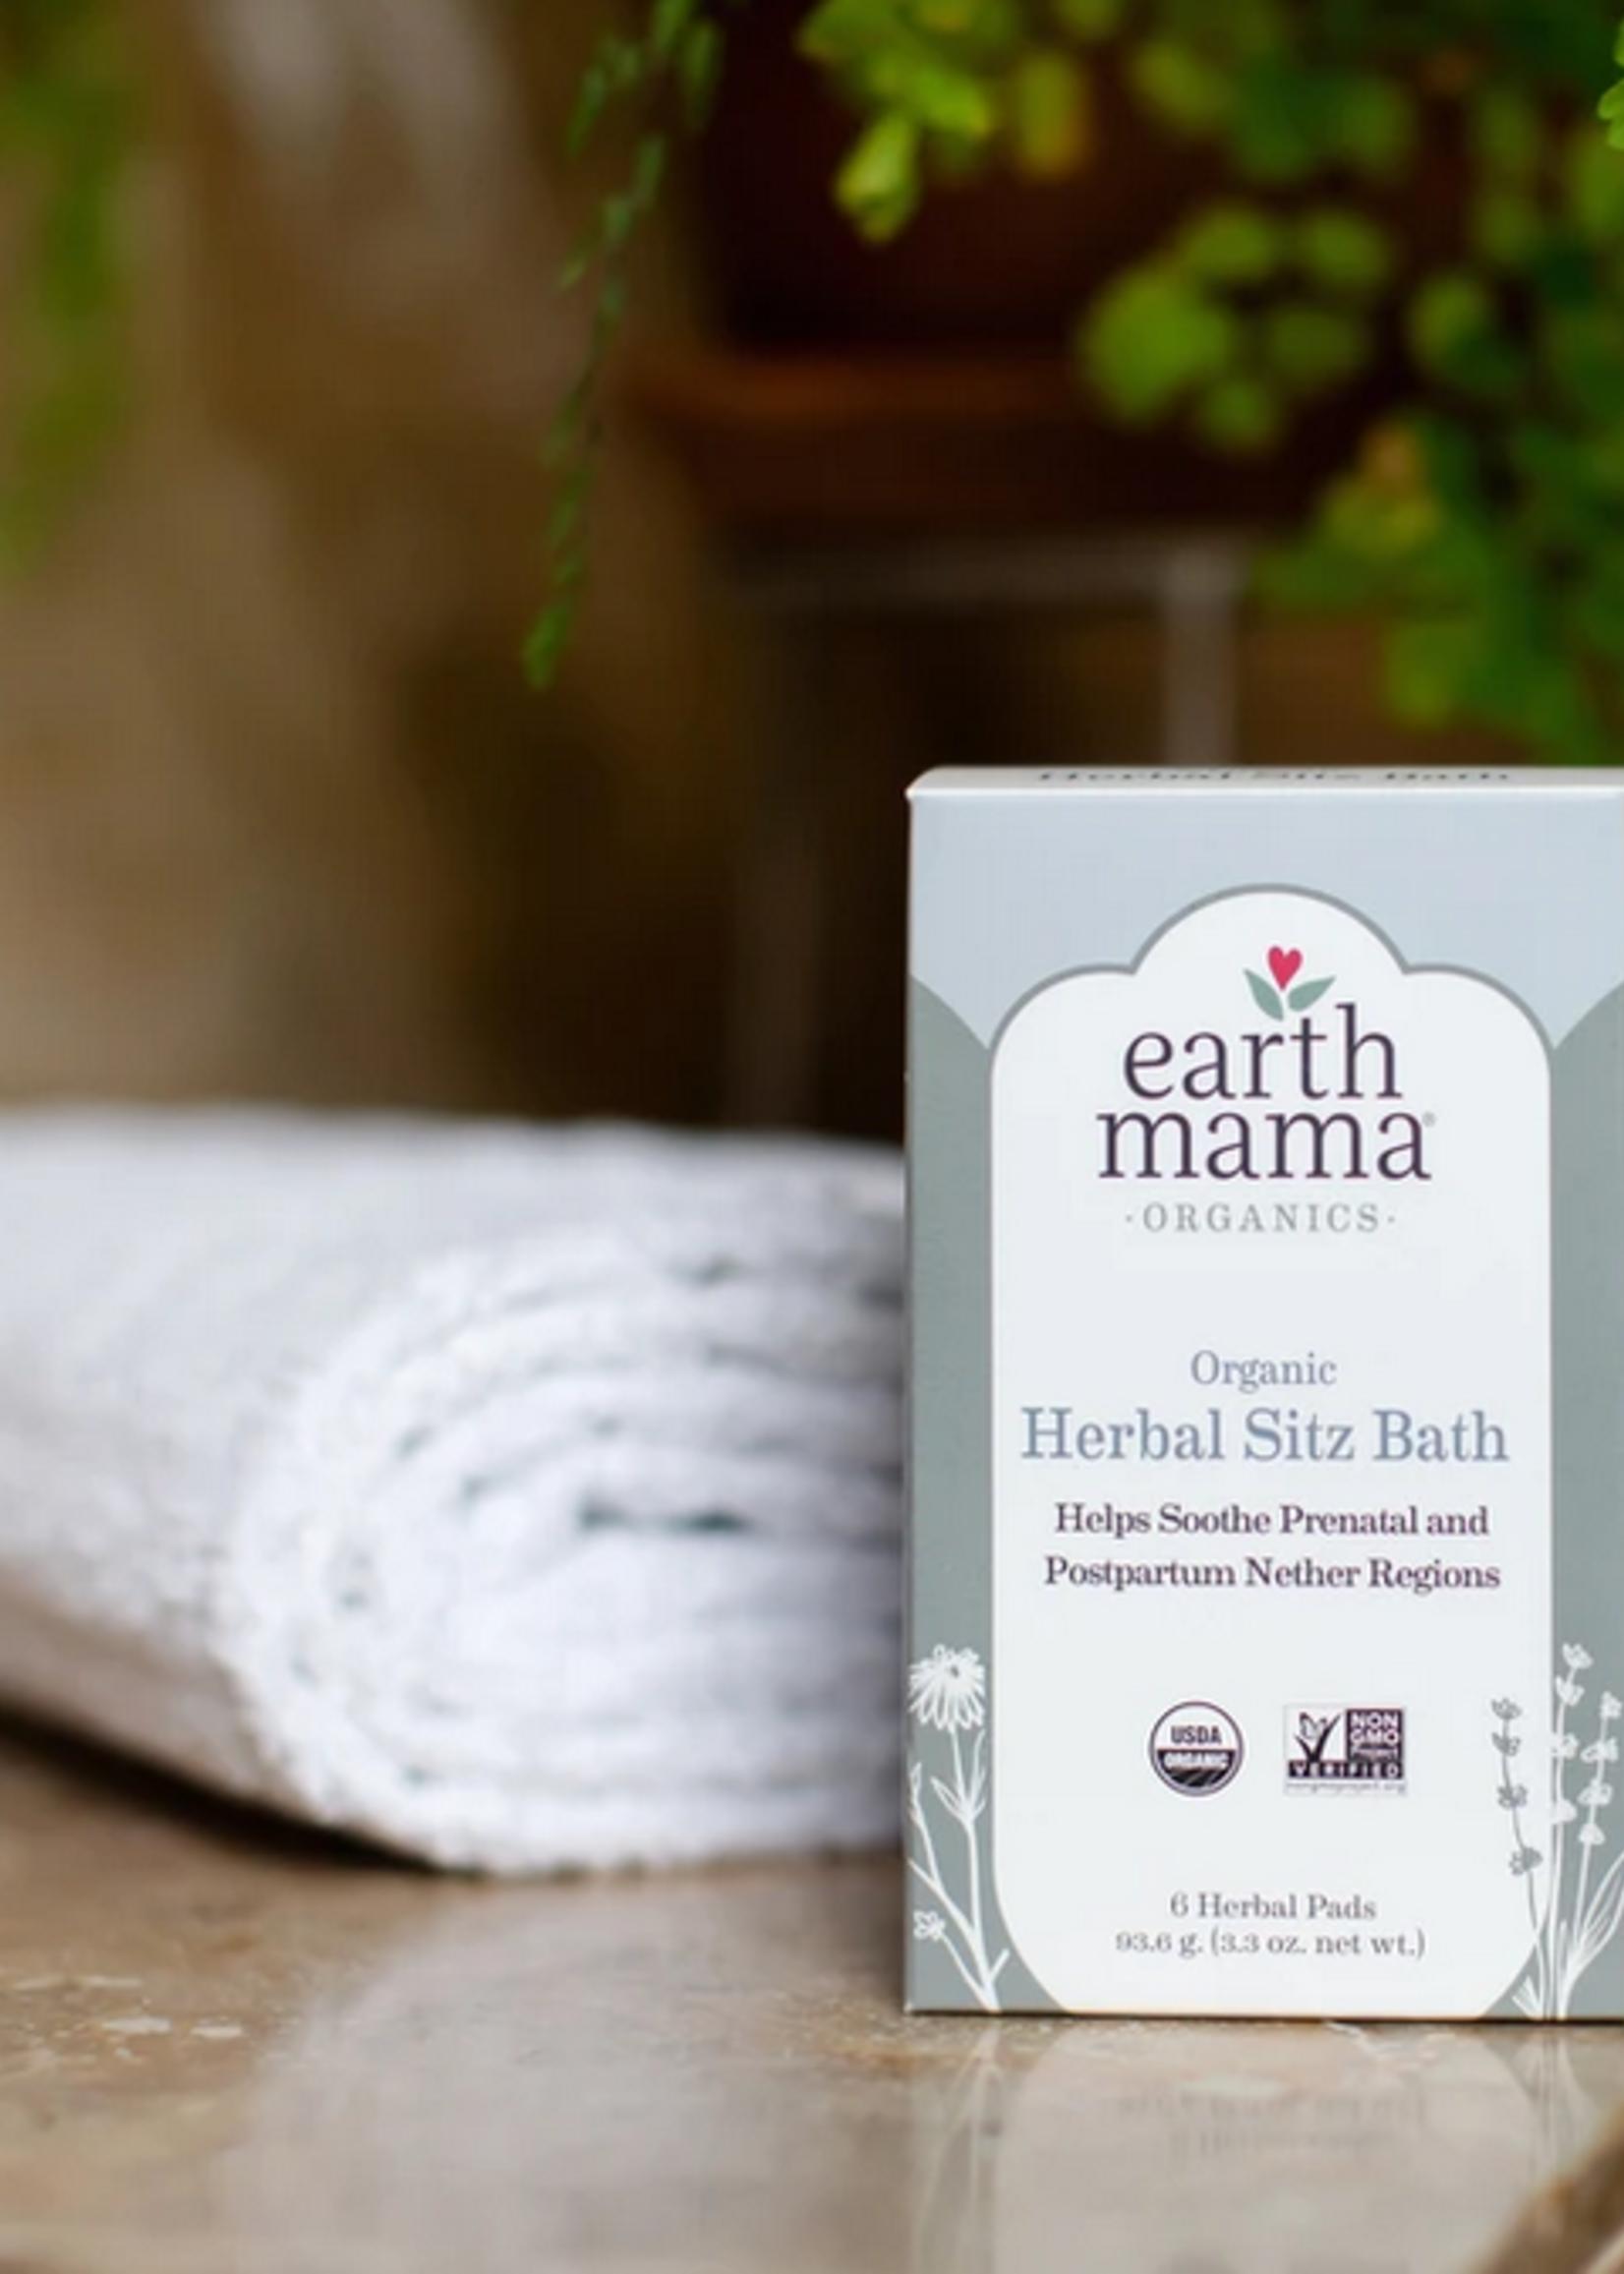 Elitaire Petite The Maman Box